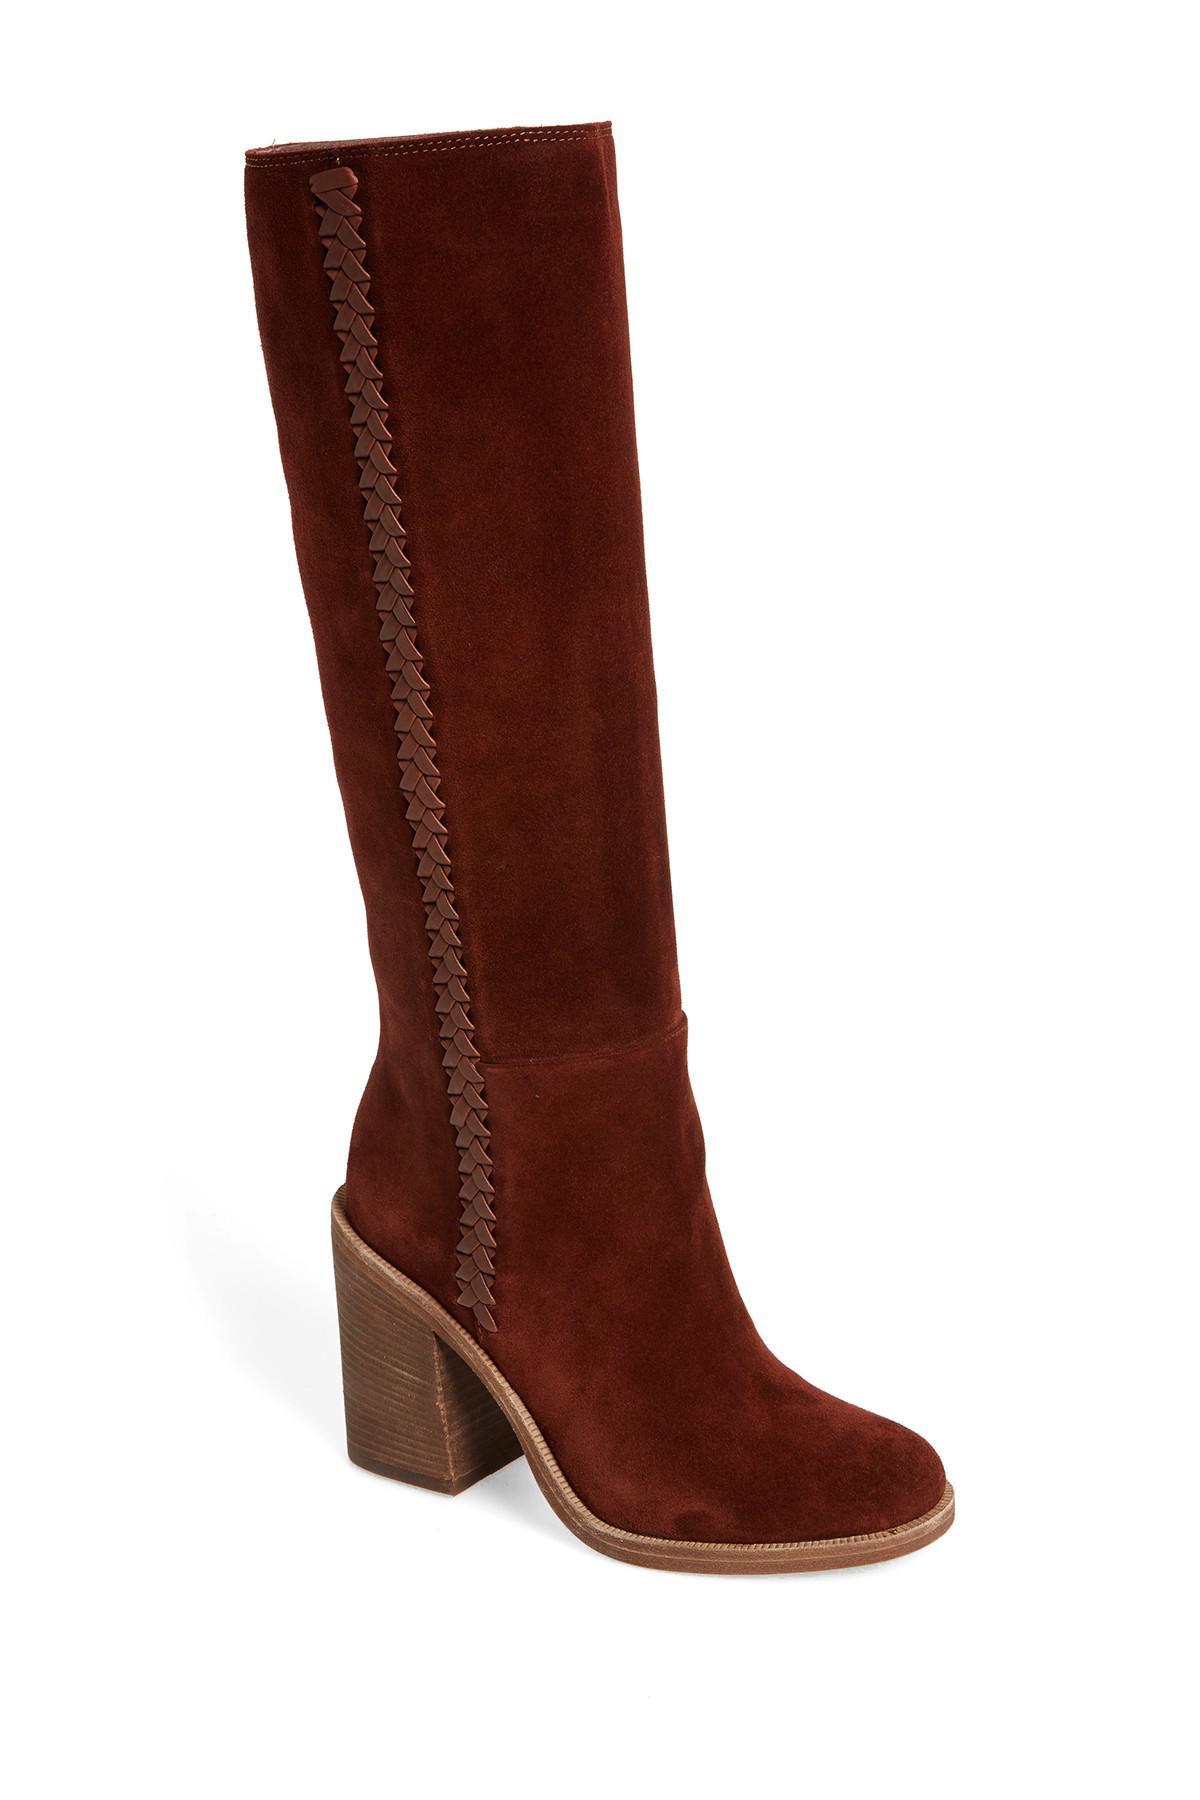 9498b36e021 Ugg Brown Maeva Suede Boot